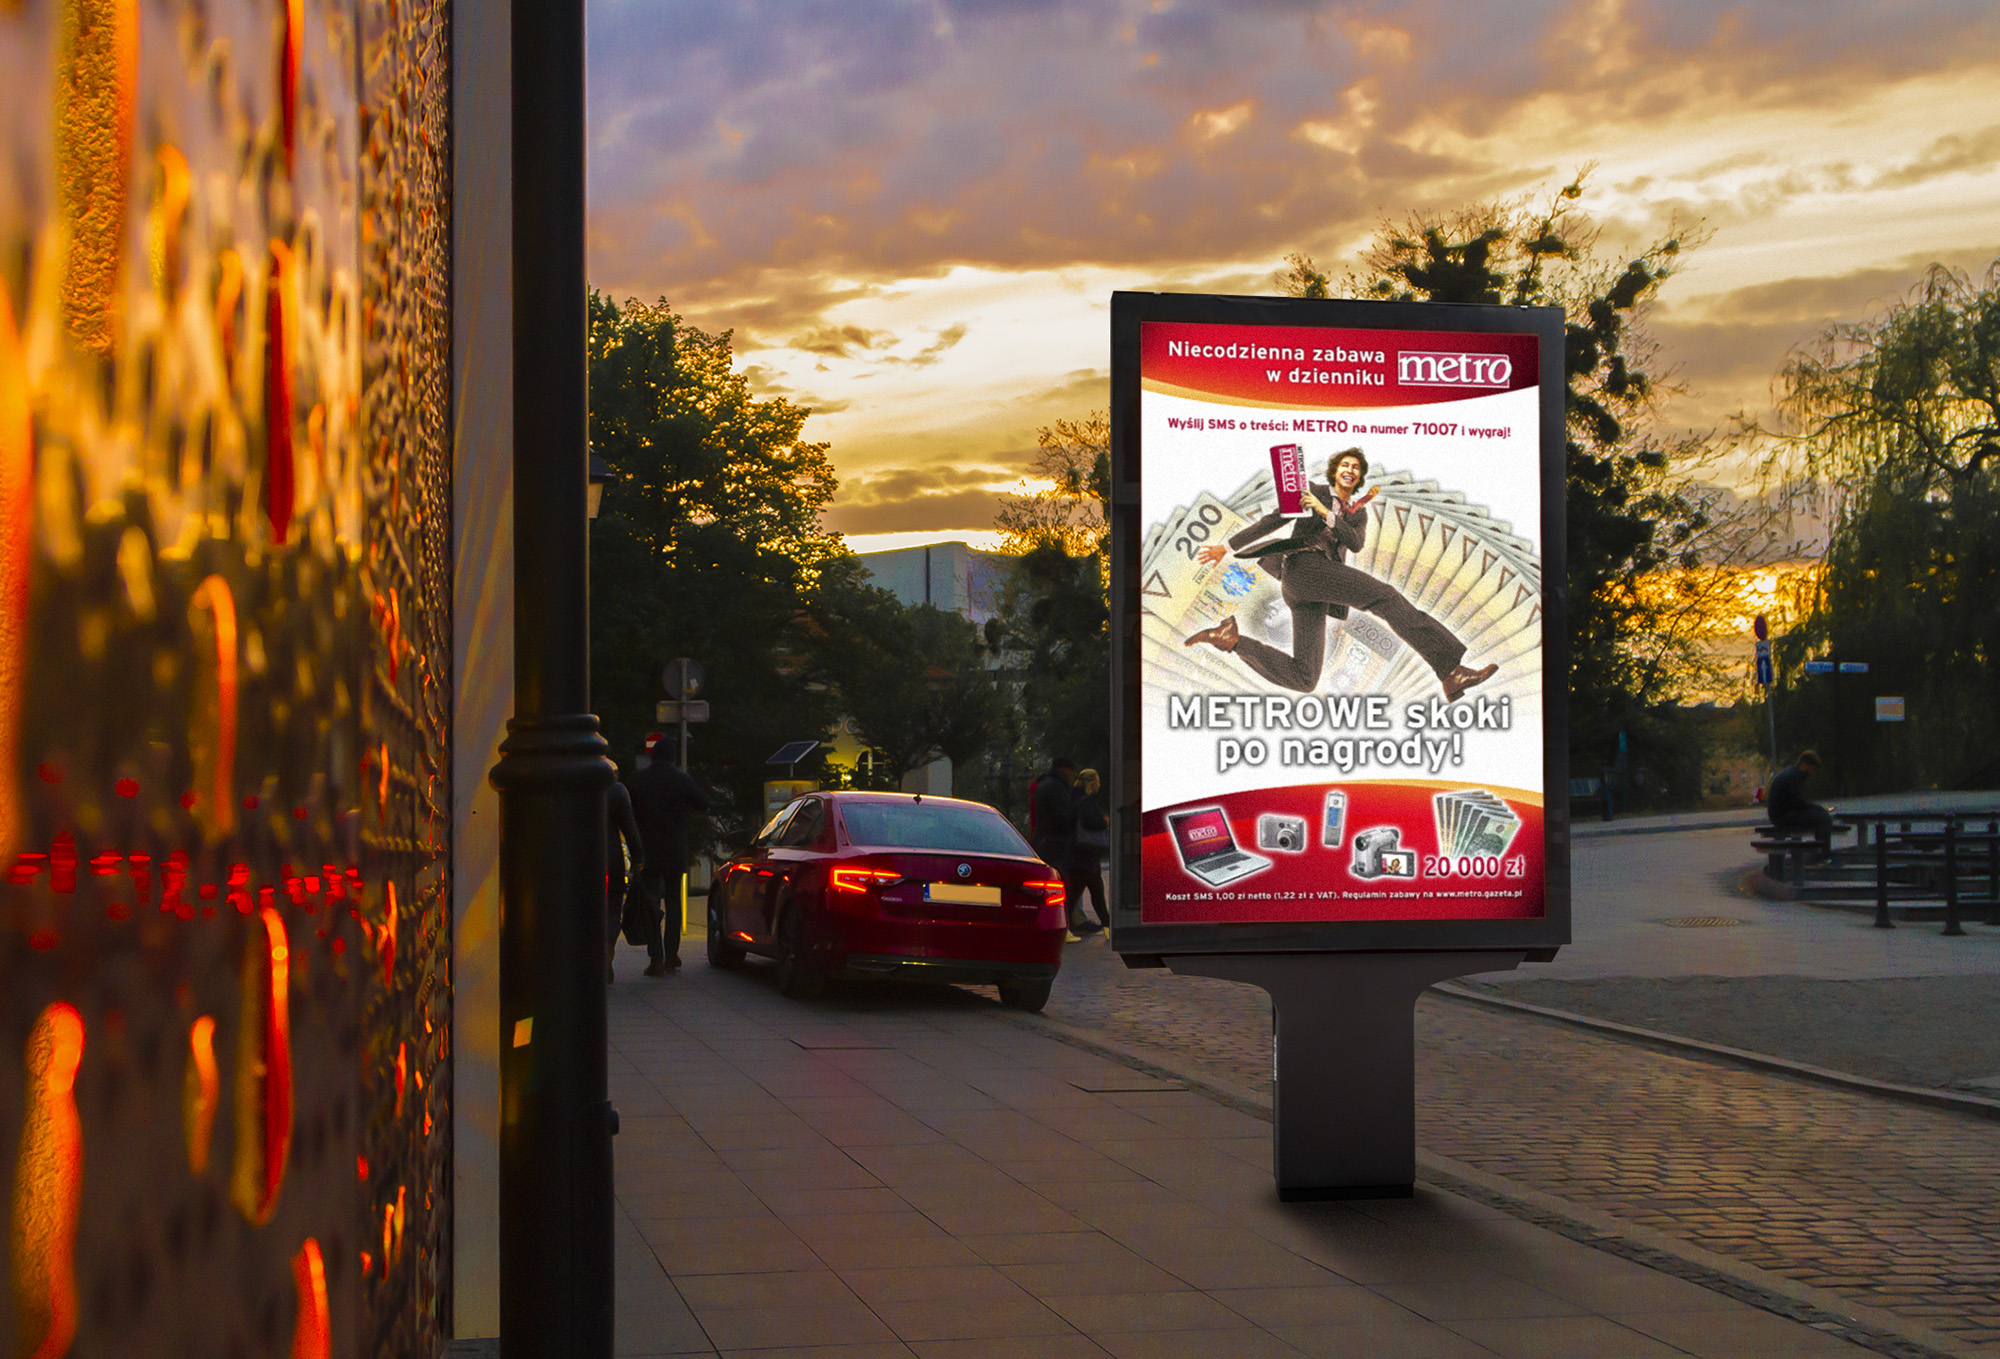 outdoor, plakat citylight reklamowy metro konkurs, projekty graficzne, design newspaper, ilustracja, concept art, key visual, art designer Ireneusz Bloch